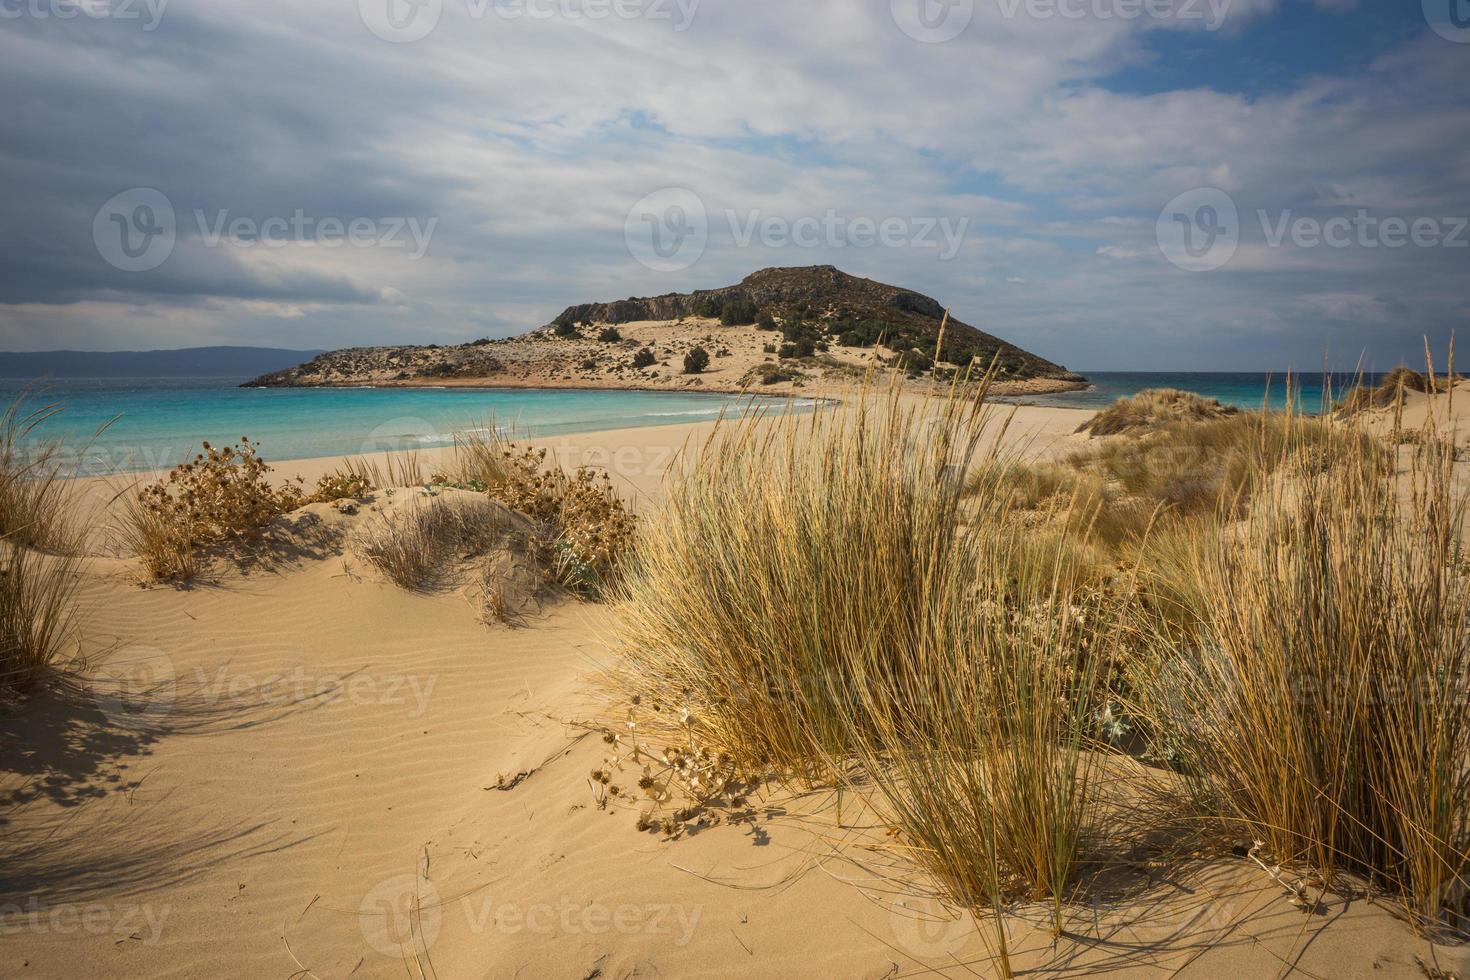 Narrow braid to the semi-island, Simos beach, Elafonisos, Greece photo